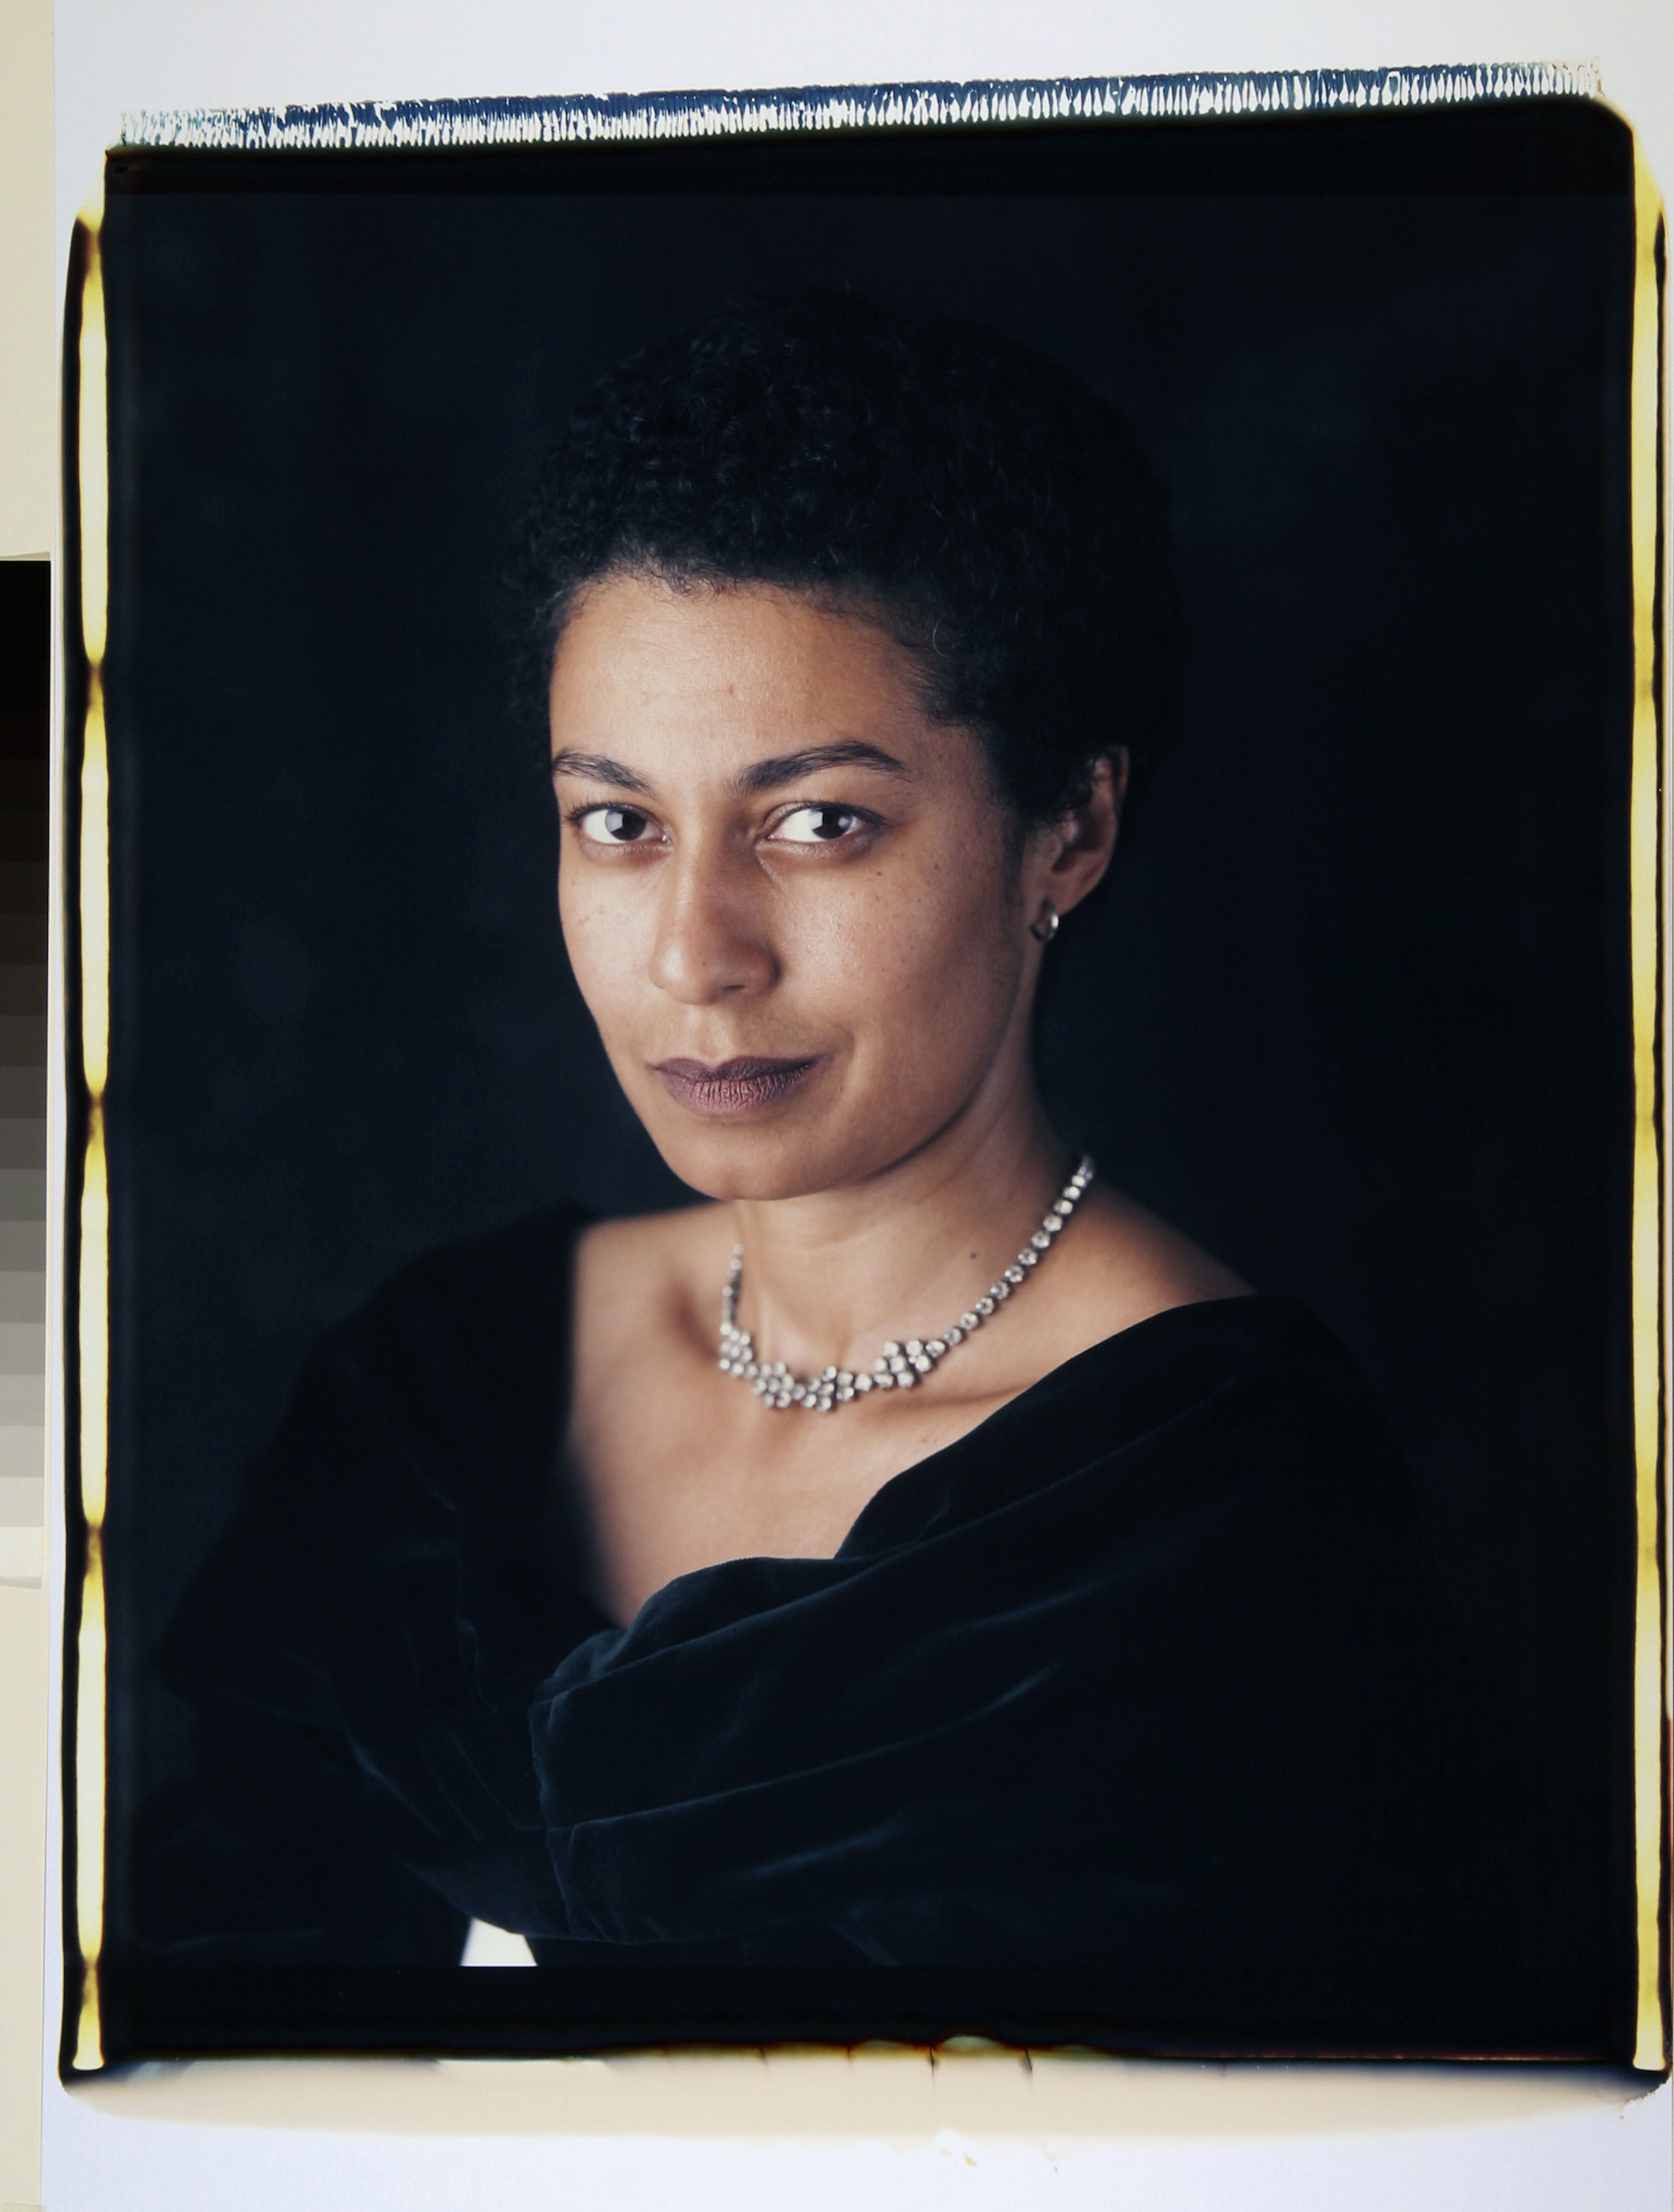 Les Bijoux IX, 2002 © Maud Sulter, courtesy the Estate of Maud Sulter